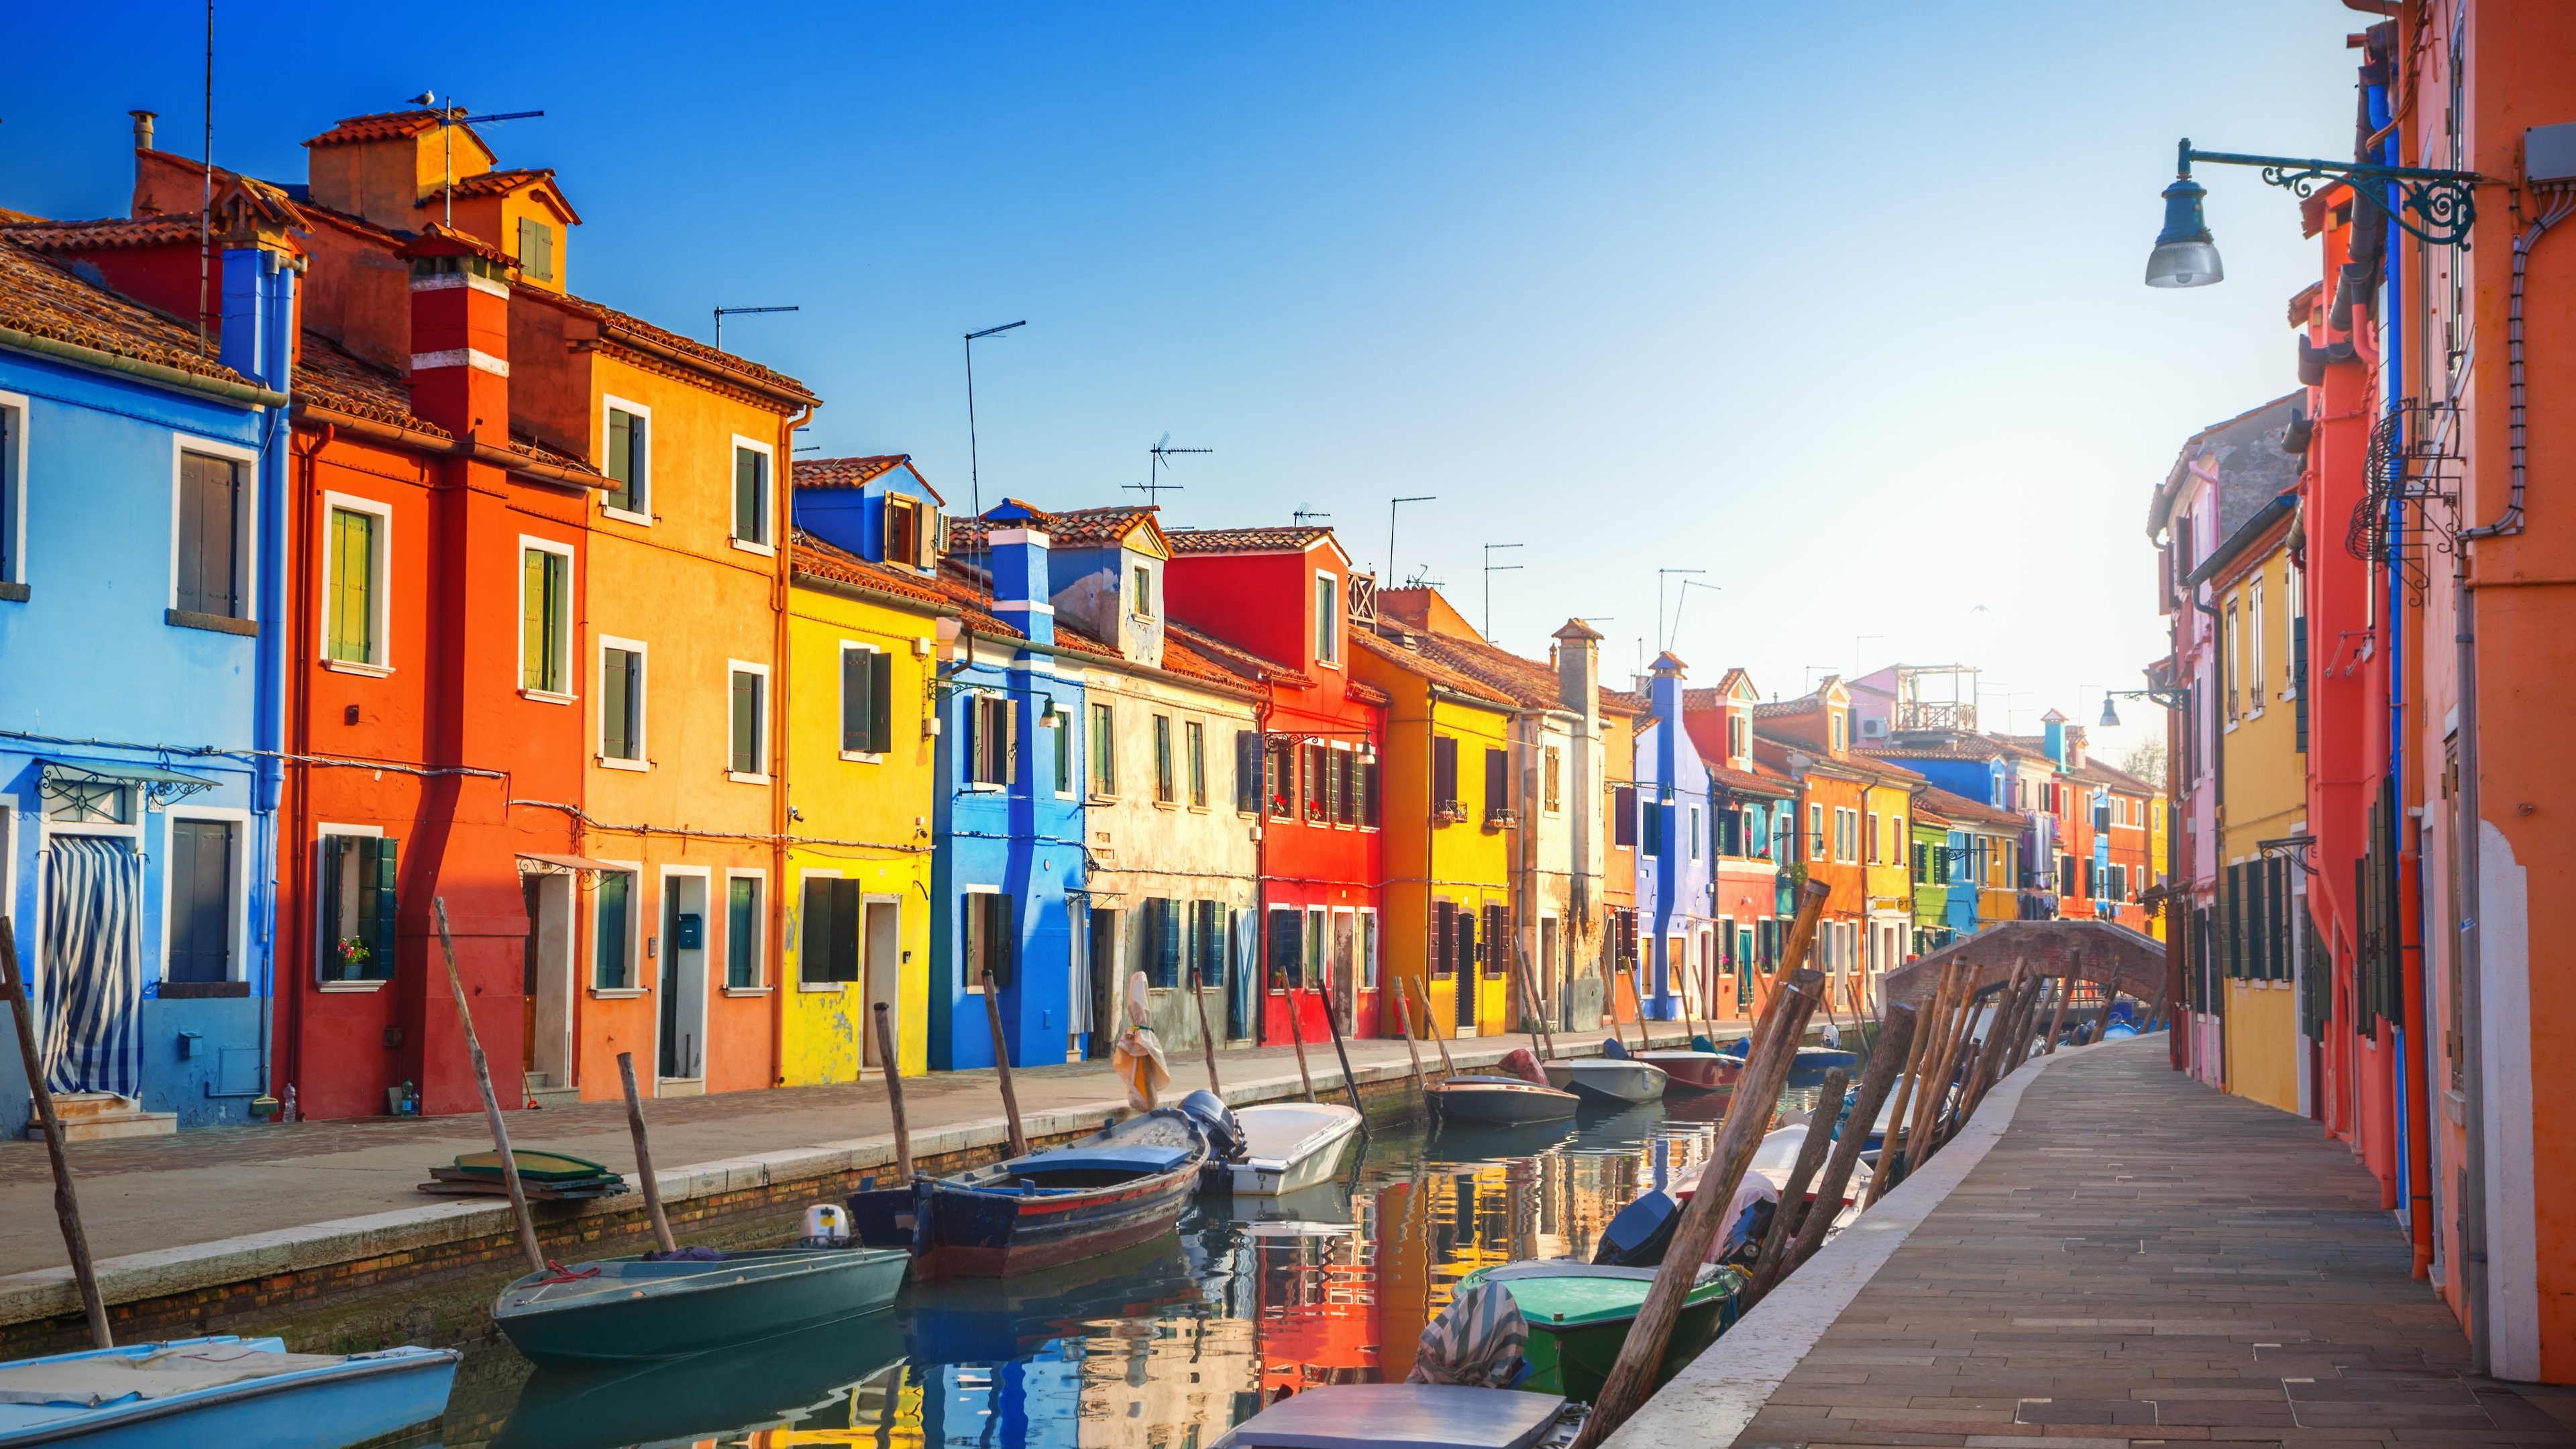 venice city boats 4k 5k 1538069354 - Venice City Boats 4k 5k - world wallpapers, venice wallpapers, hd-wallpapers, city wallpapers, boats wallpapers, 5k wallpapers, 4k-wallpapers